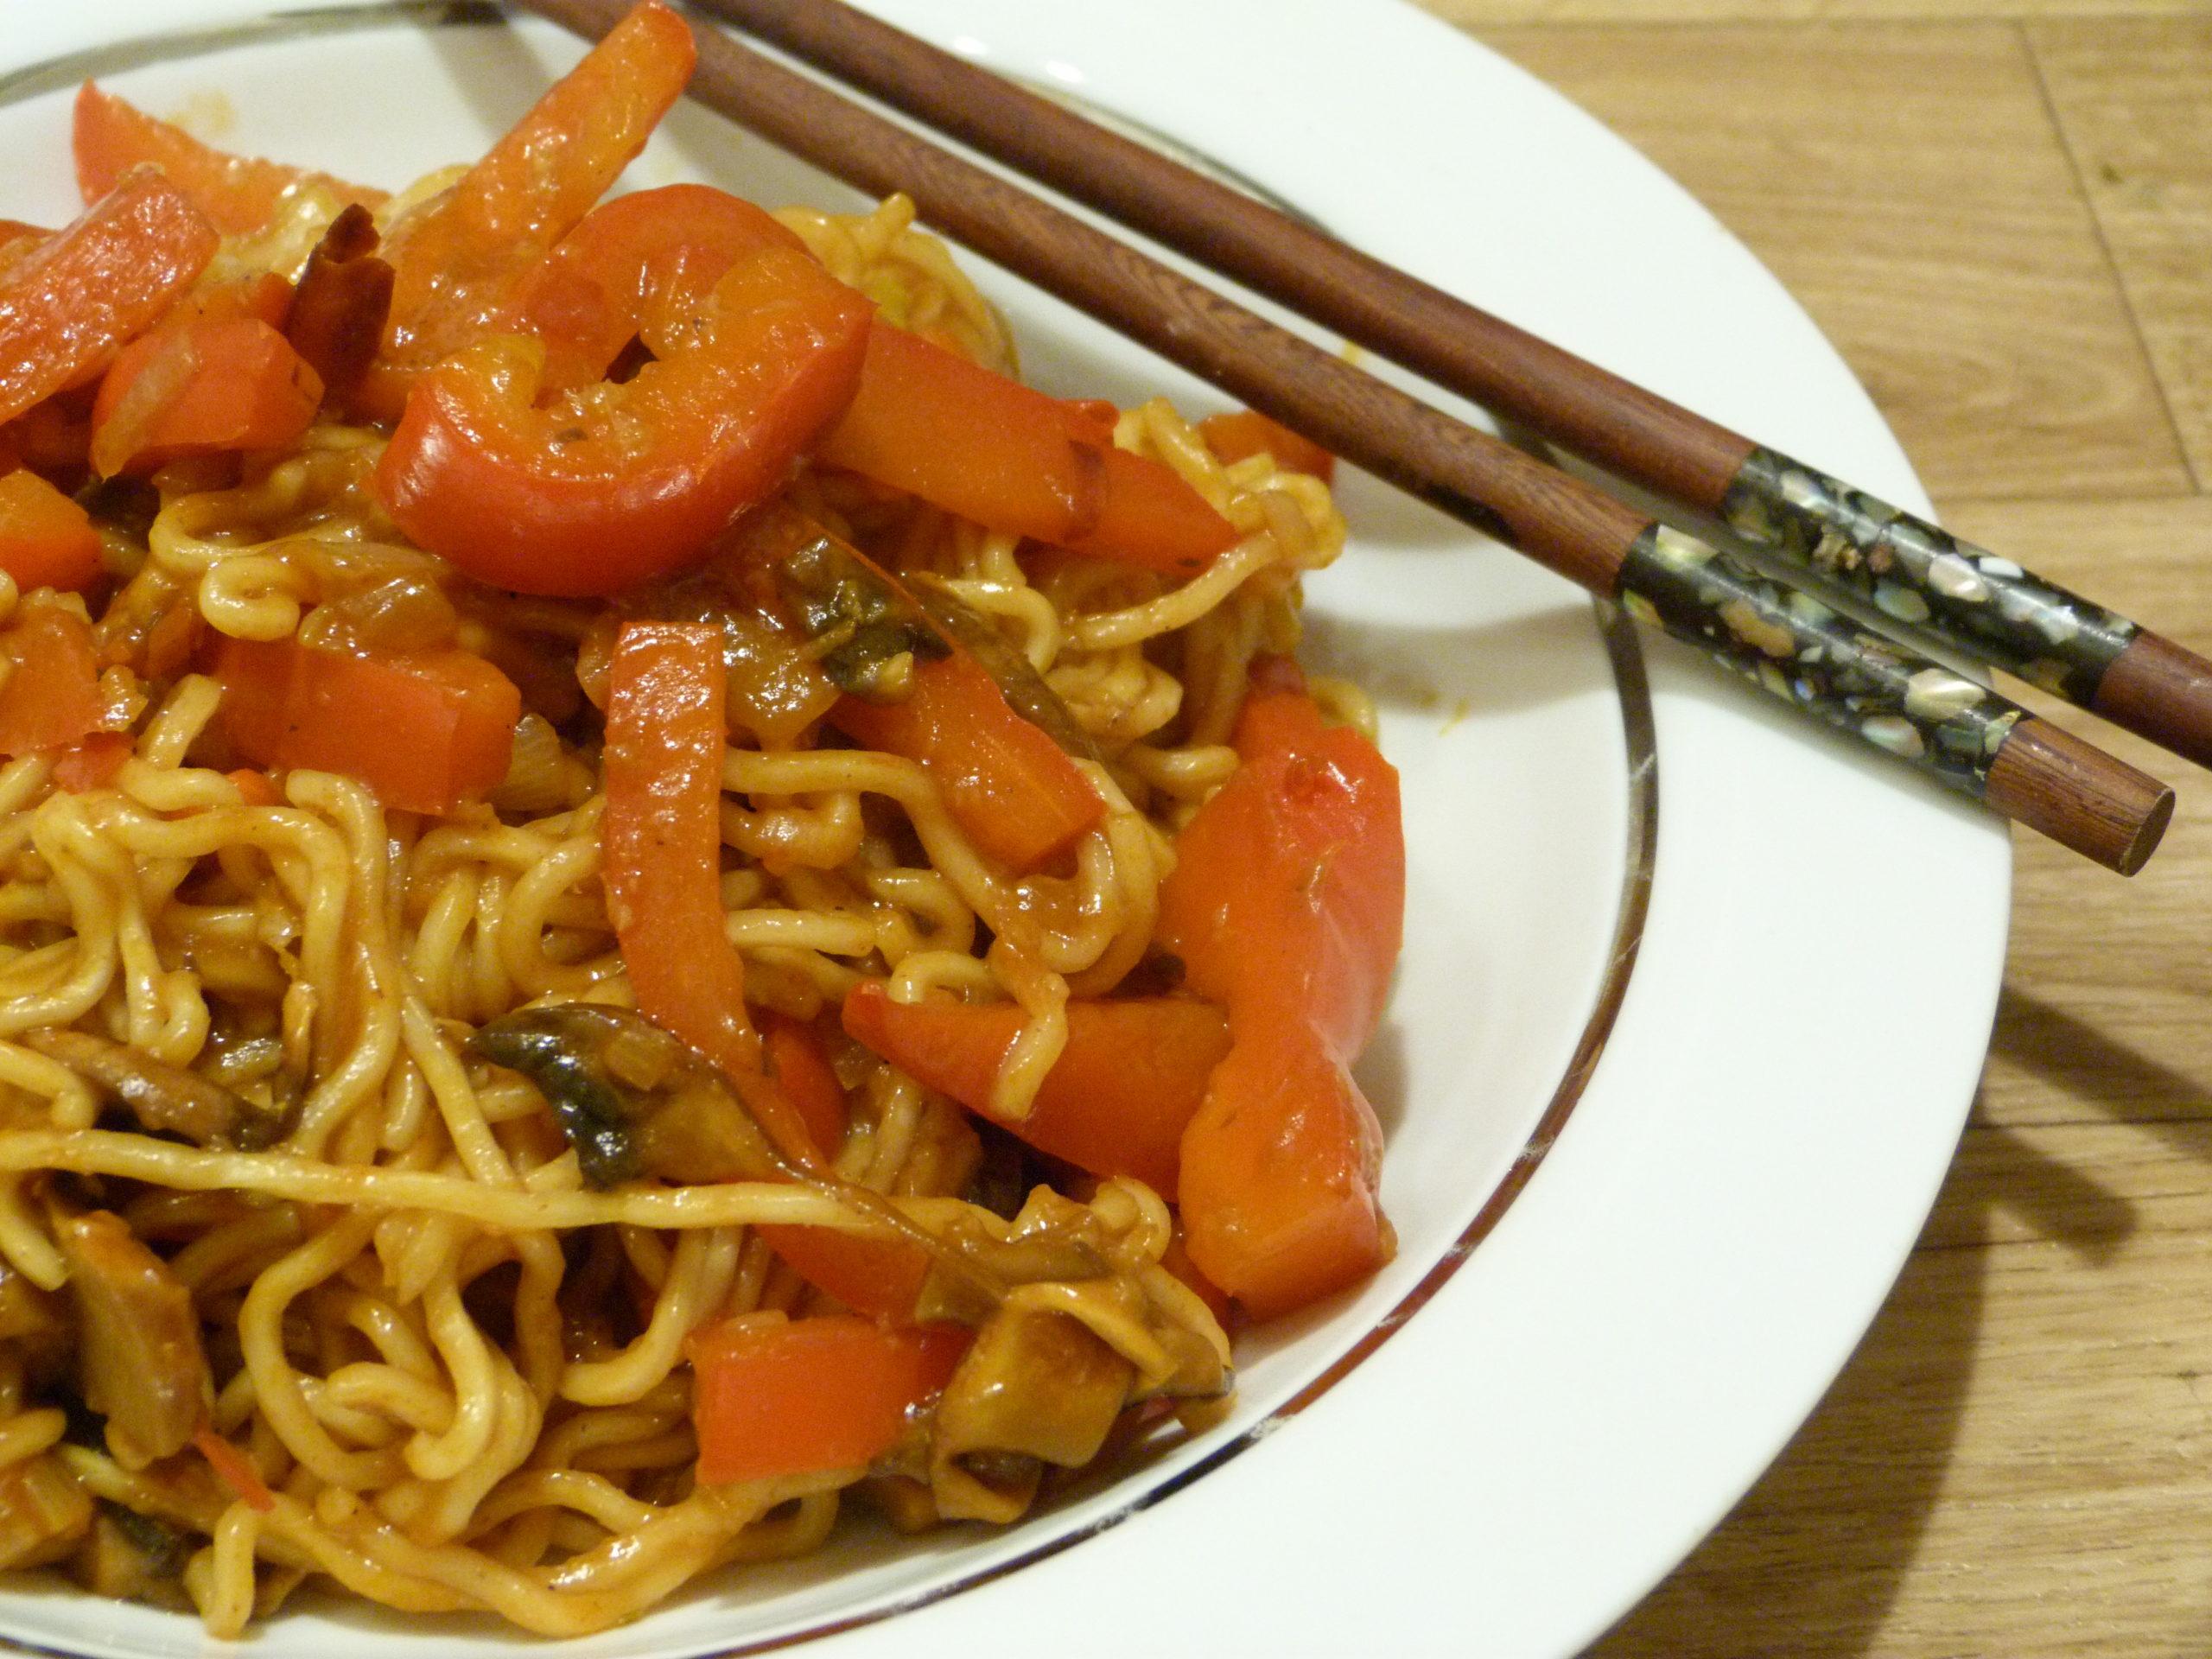 Scharfe Nudeln – Asiatische Nudelpfanne